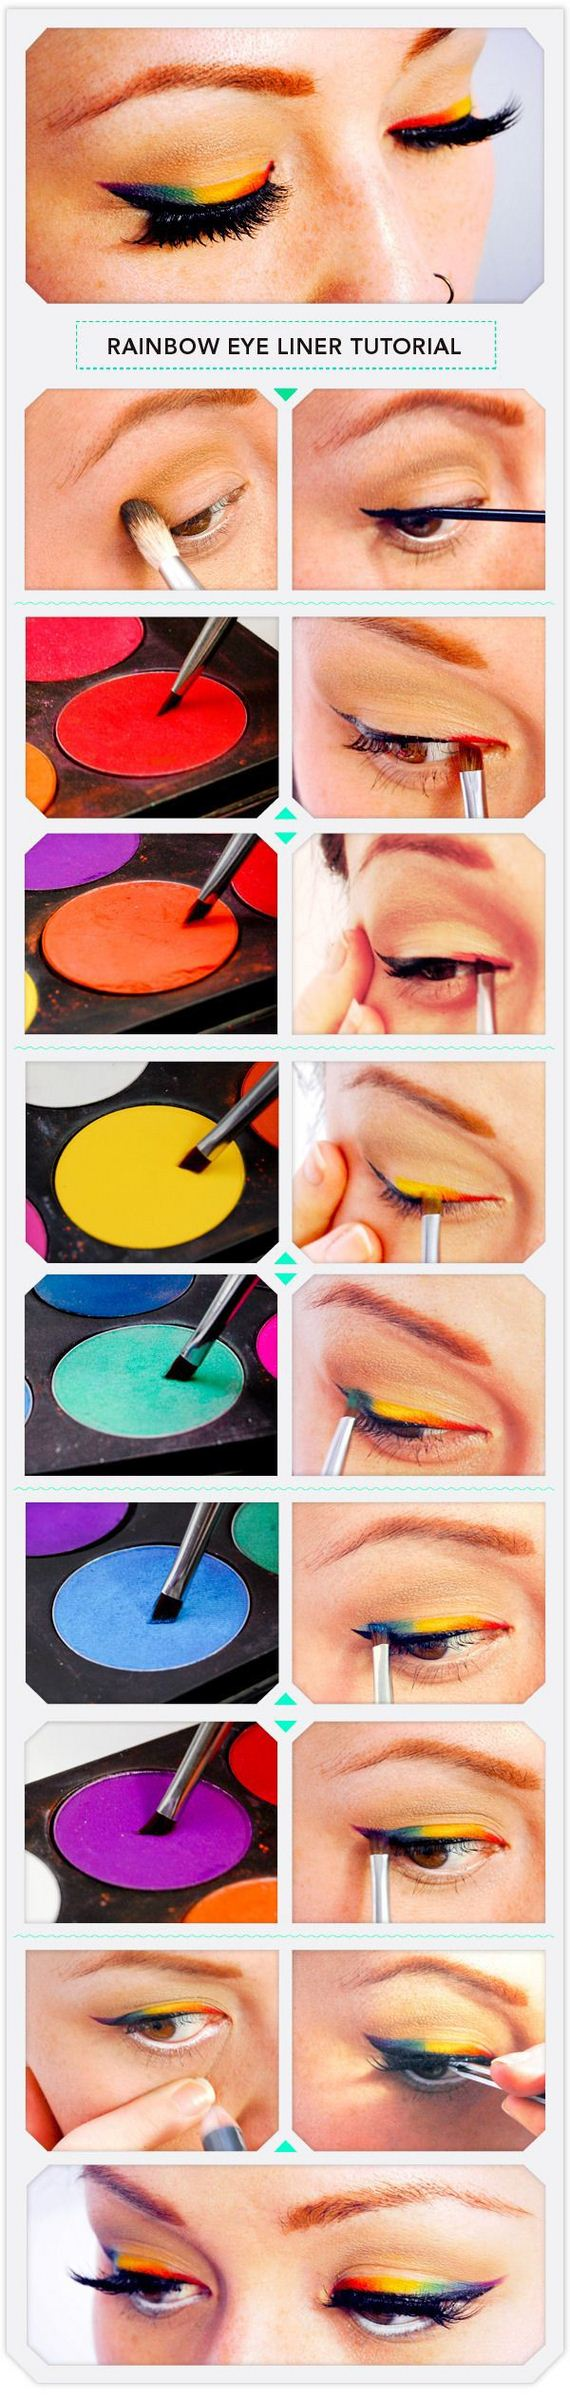 05-Fun-Eyeliner-Tutorials